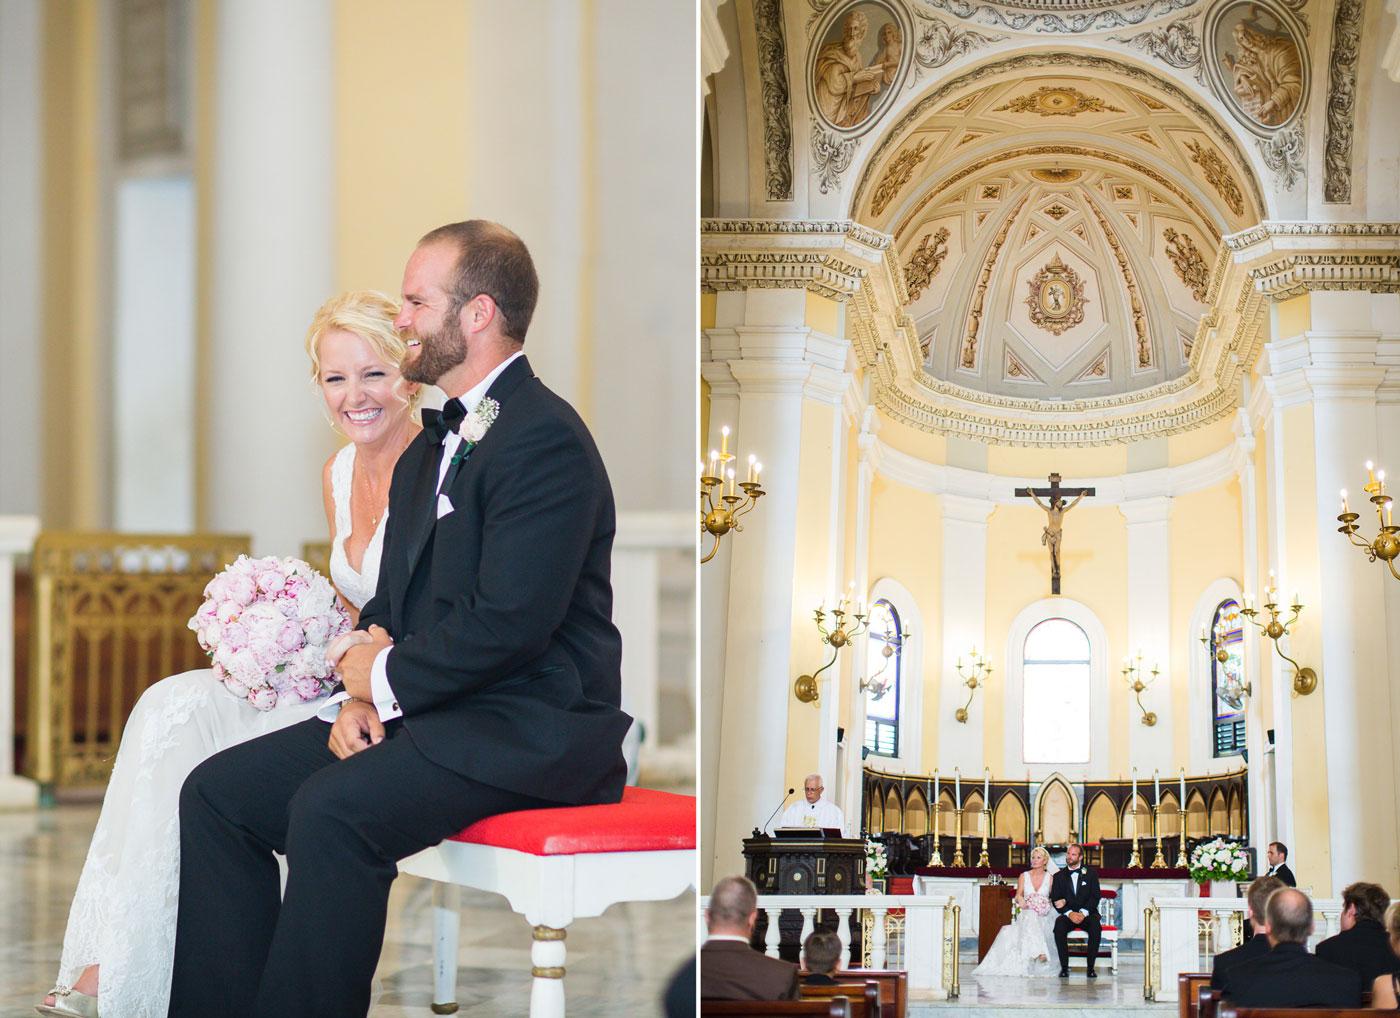 Puerto-Rico-Wedding-Photographer20.jpg